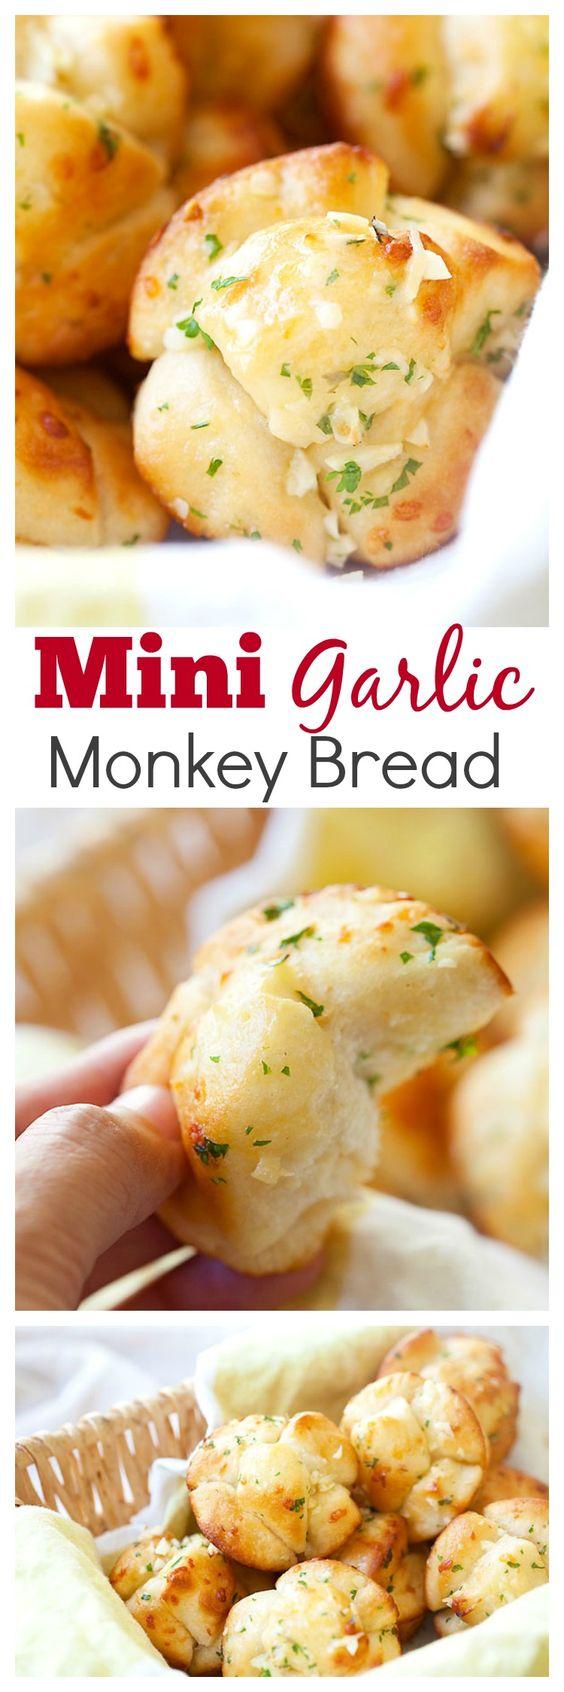 Mini garlic monkey bread – best and easiest monkey bread takes 20 mins! Use Pillsbury biscuits dough and garlic herb butter   rasamalaysia.com   @SixSistersStuff @GirlWhoAte